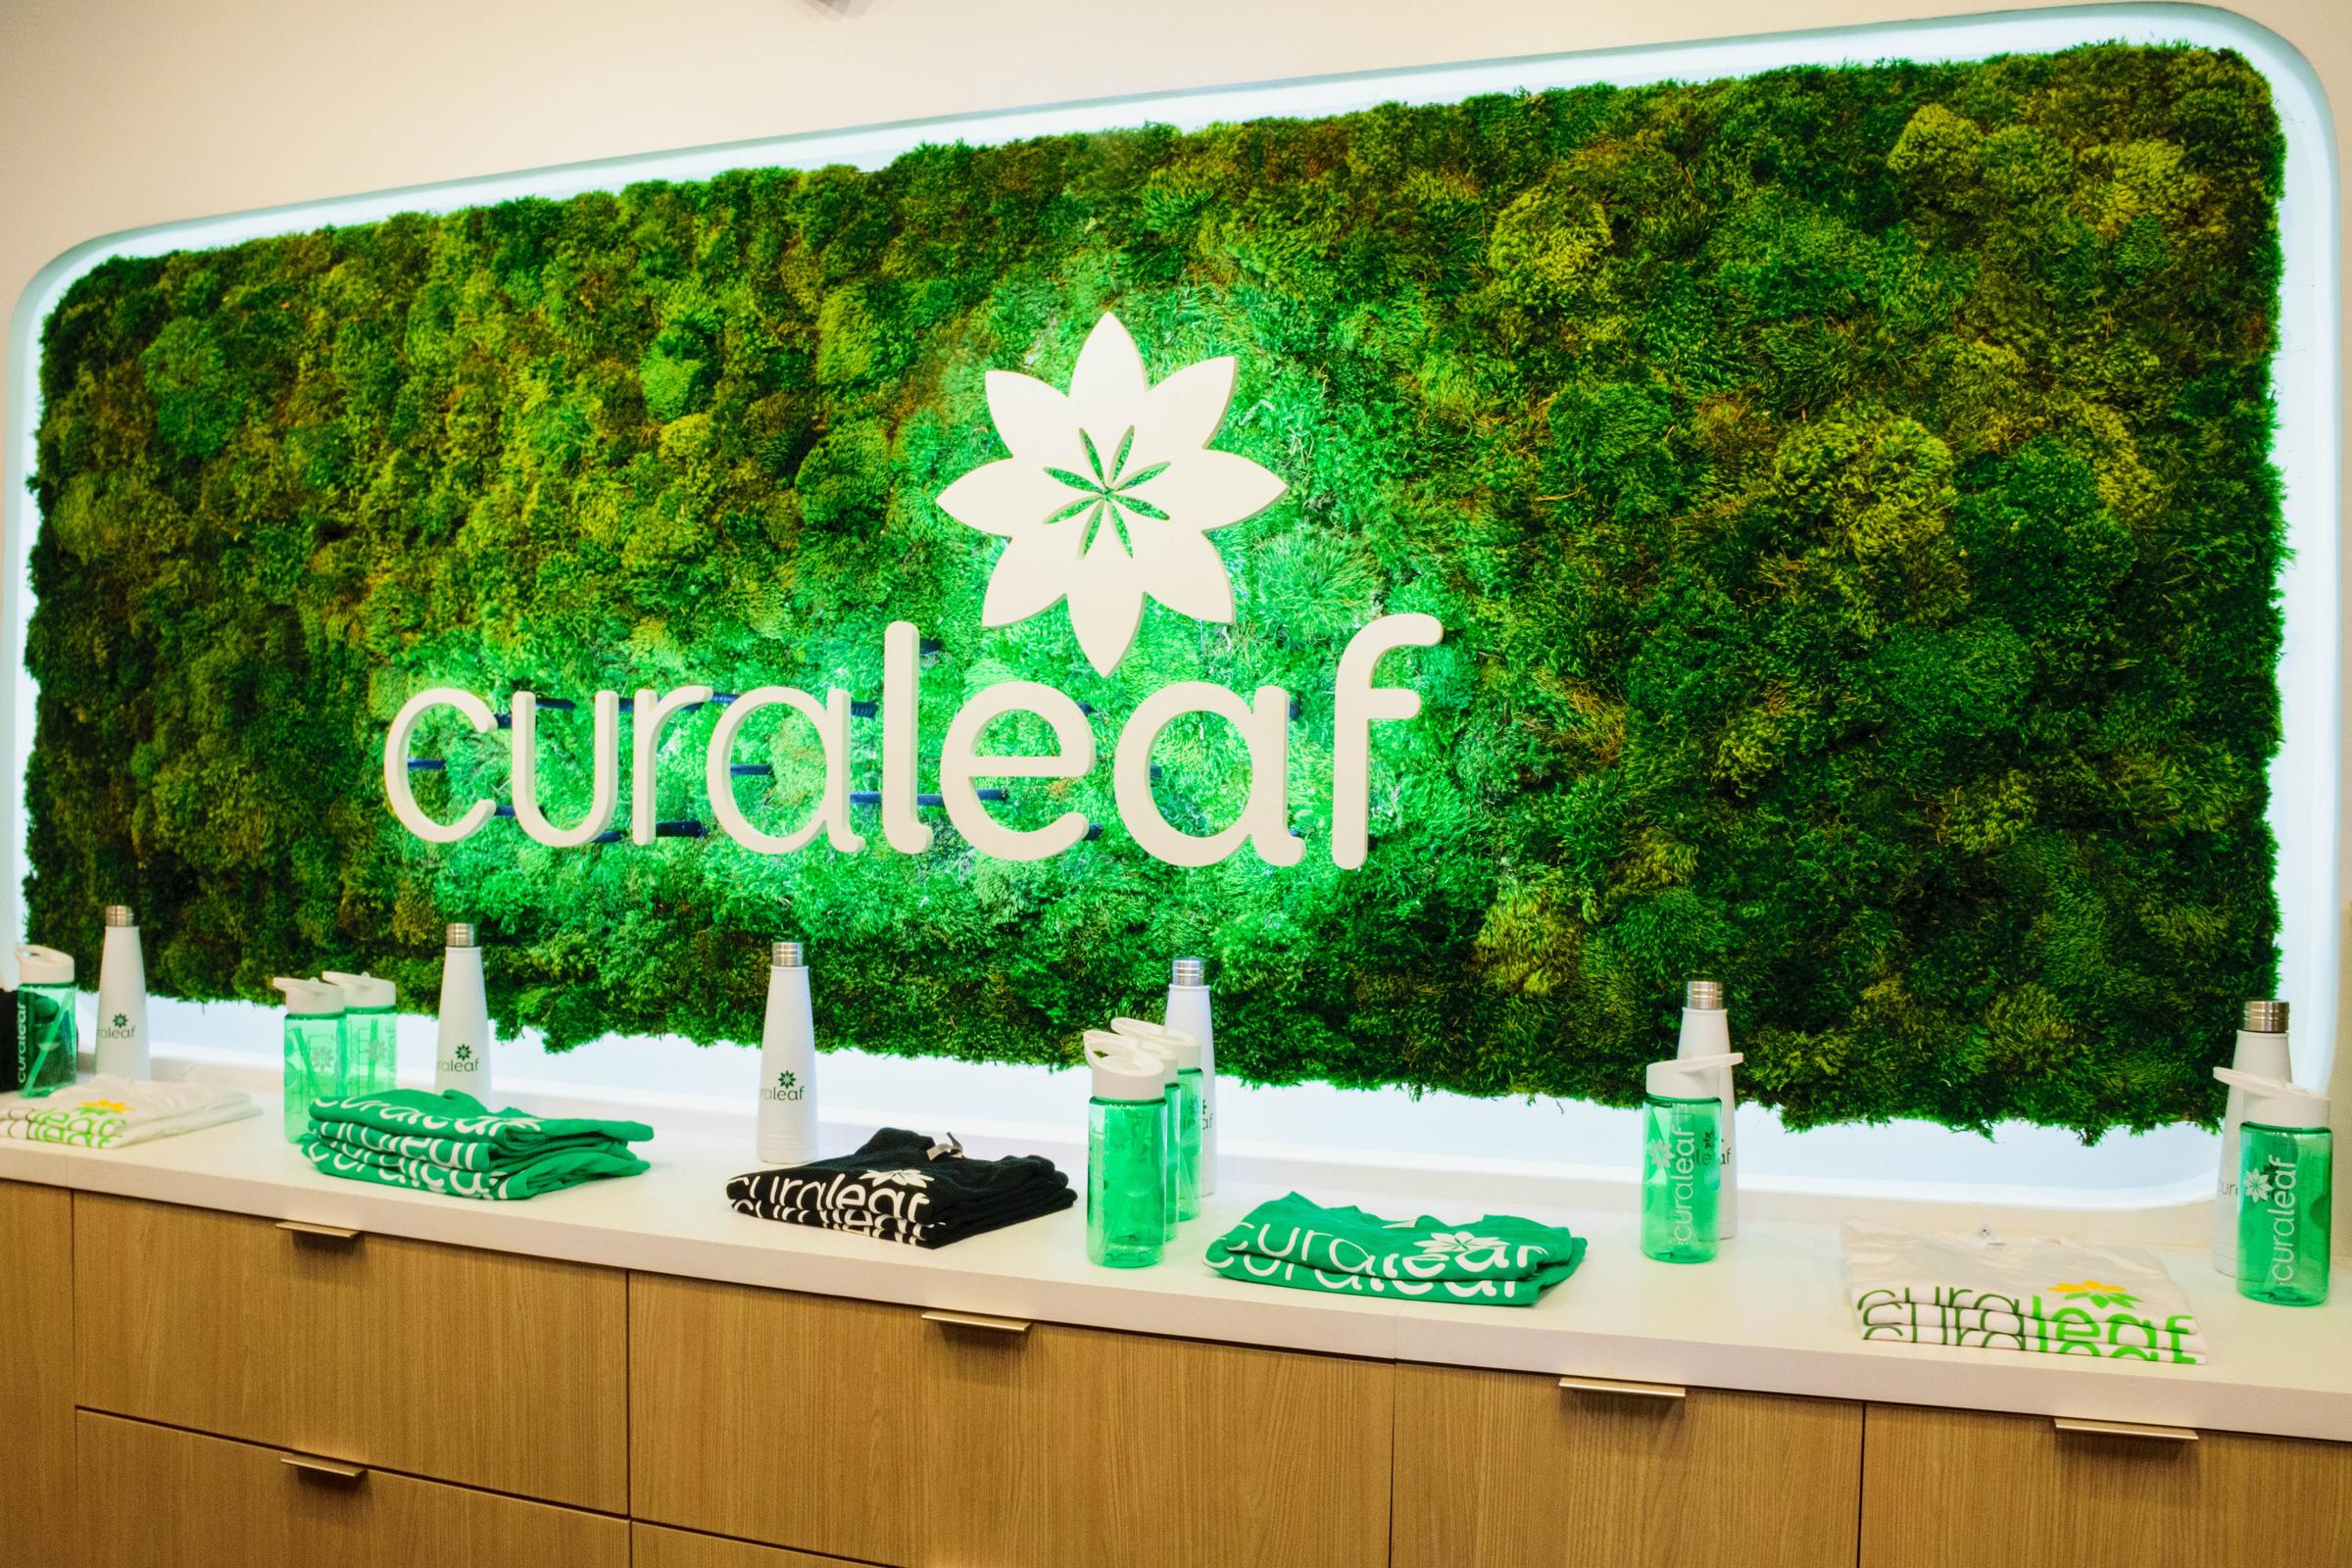 Medical Marijuana Dispensary Opens in Fort Myers Despite Ban